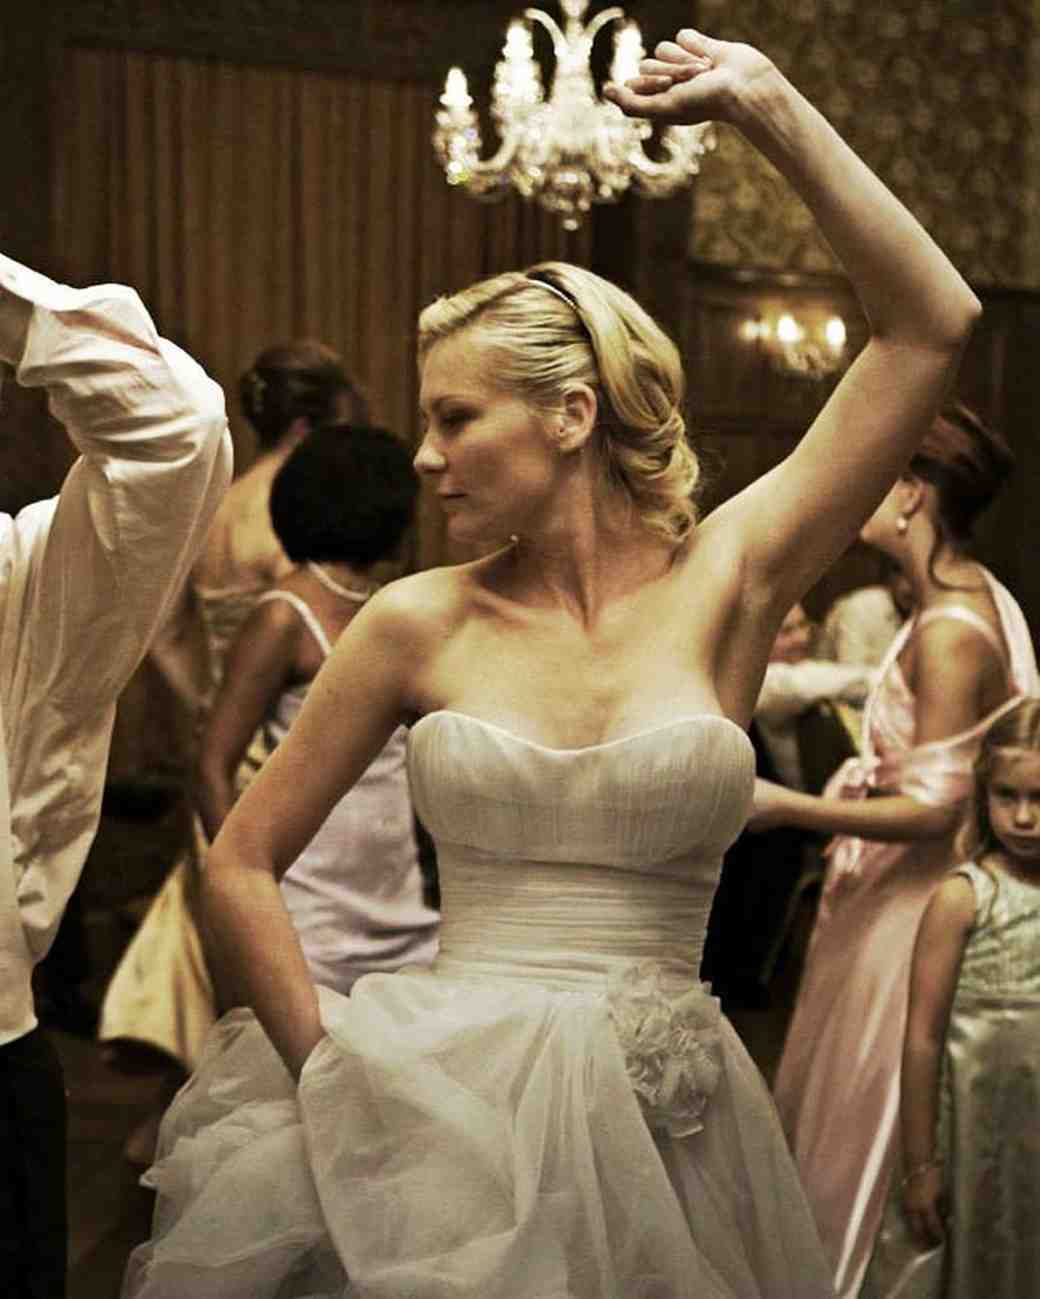 movie-wedding-dresses-melancholia-kirsten-dunst-0316.jpg